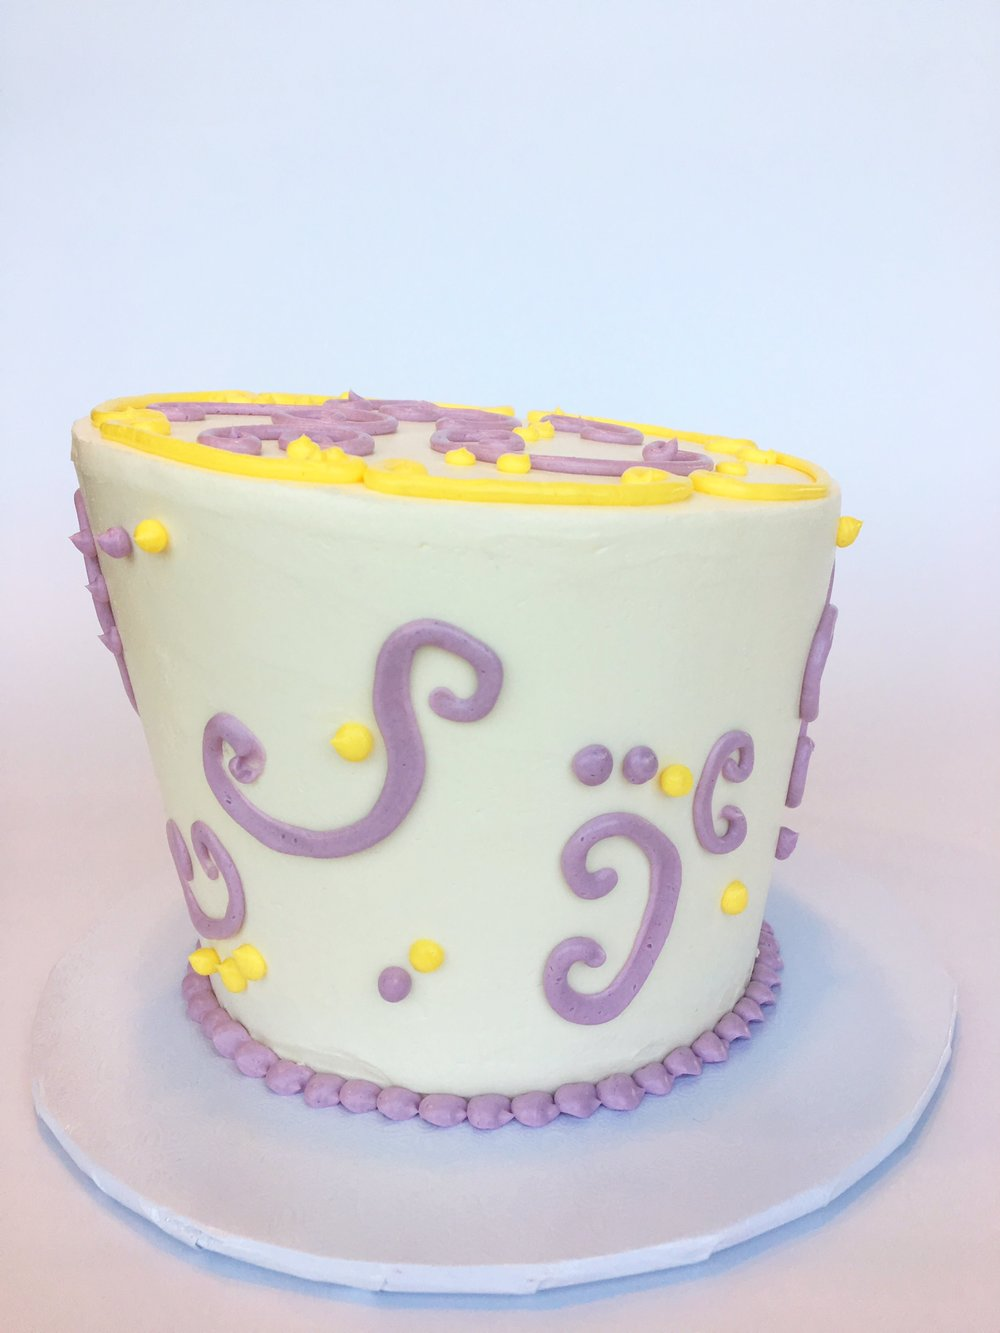 Topsy Turvy Anniversary Cake.jpg